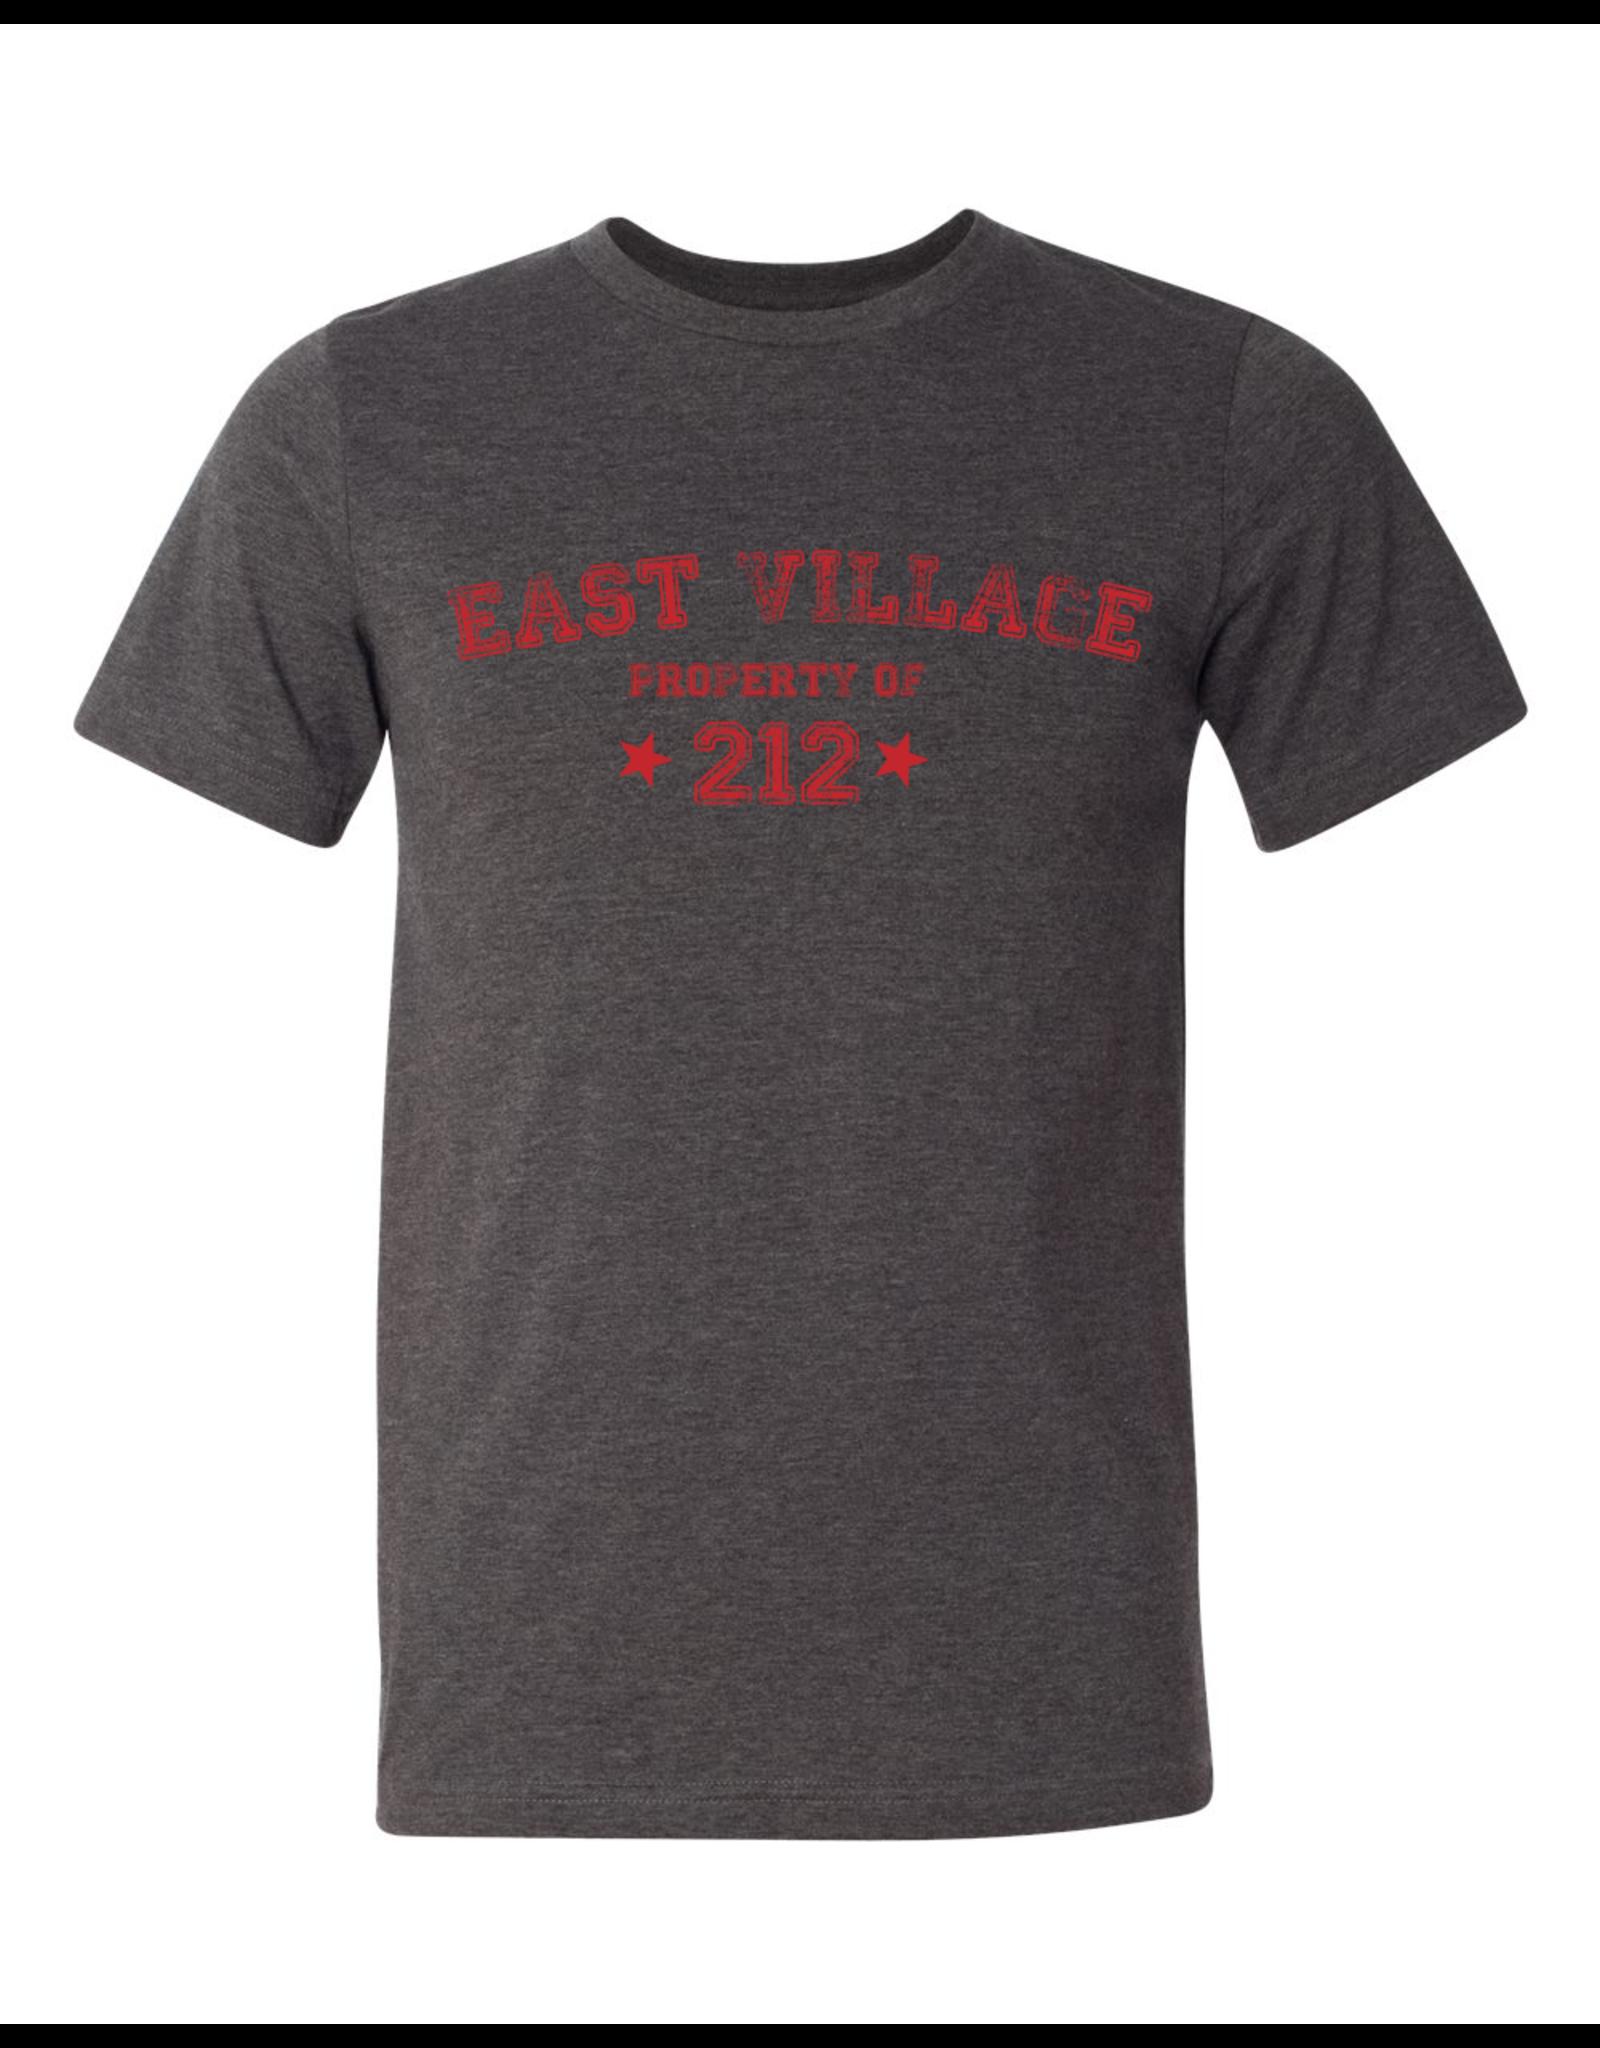 Exit9 Gift Emporium Property of East Village T-Shirt